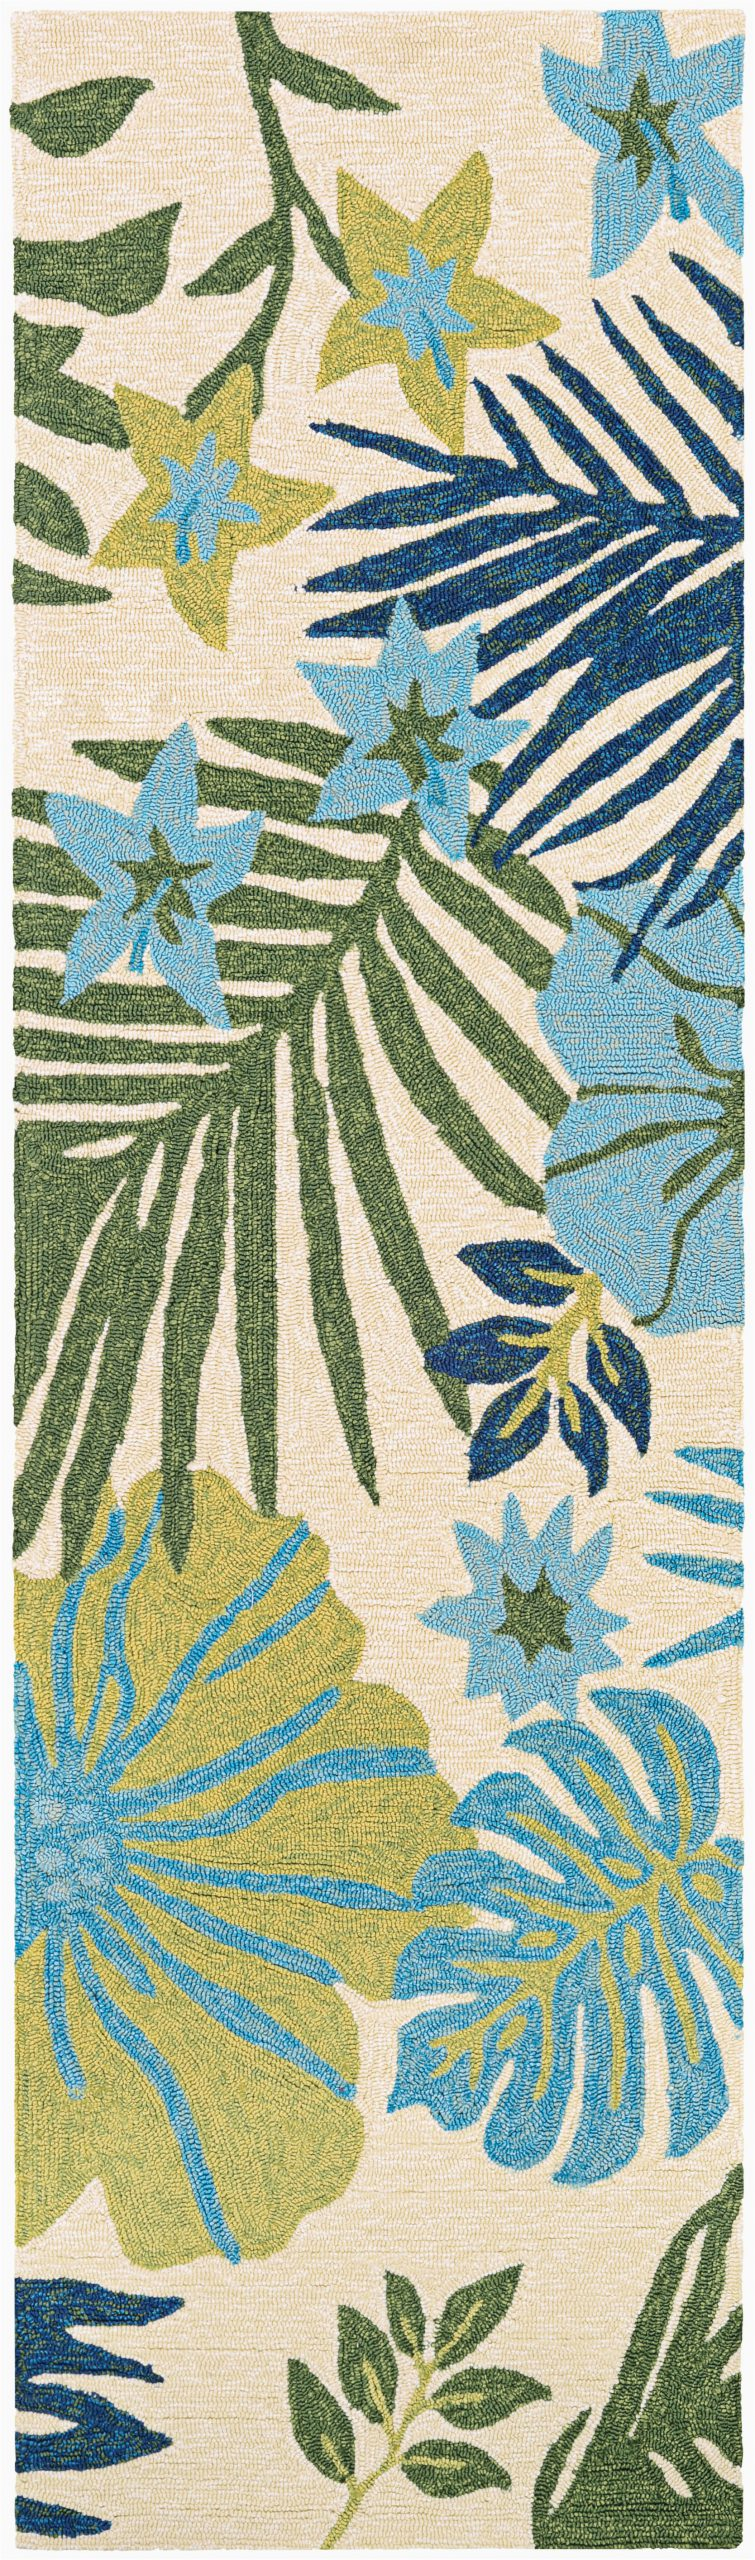 bay isle home wildermuth summer laelia hand woven ivoryfern indooroutdoor area rug bayi2846 piid=